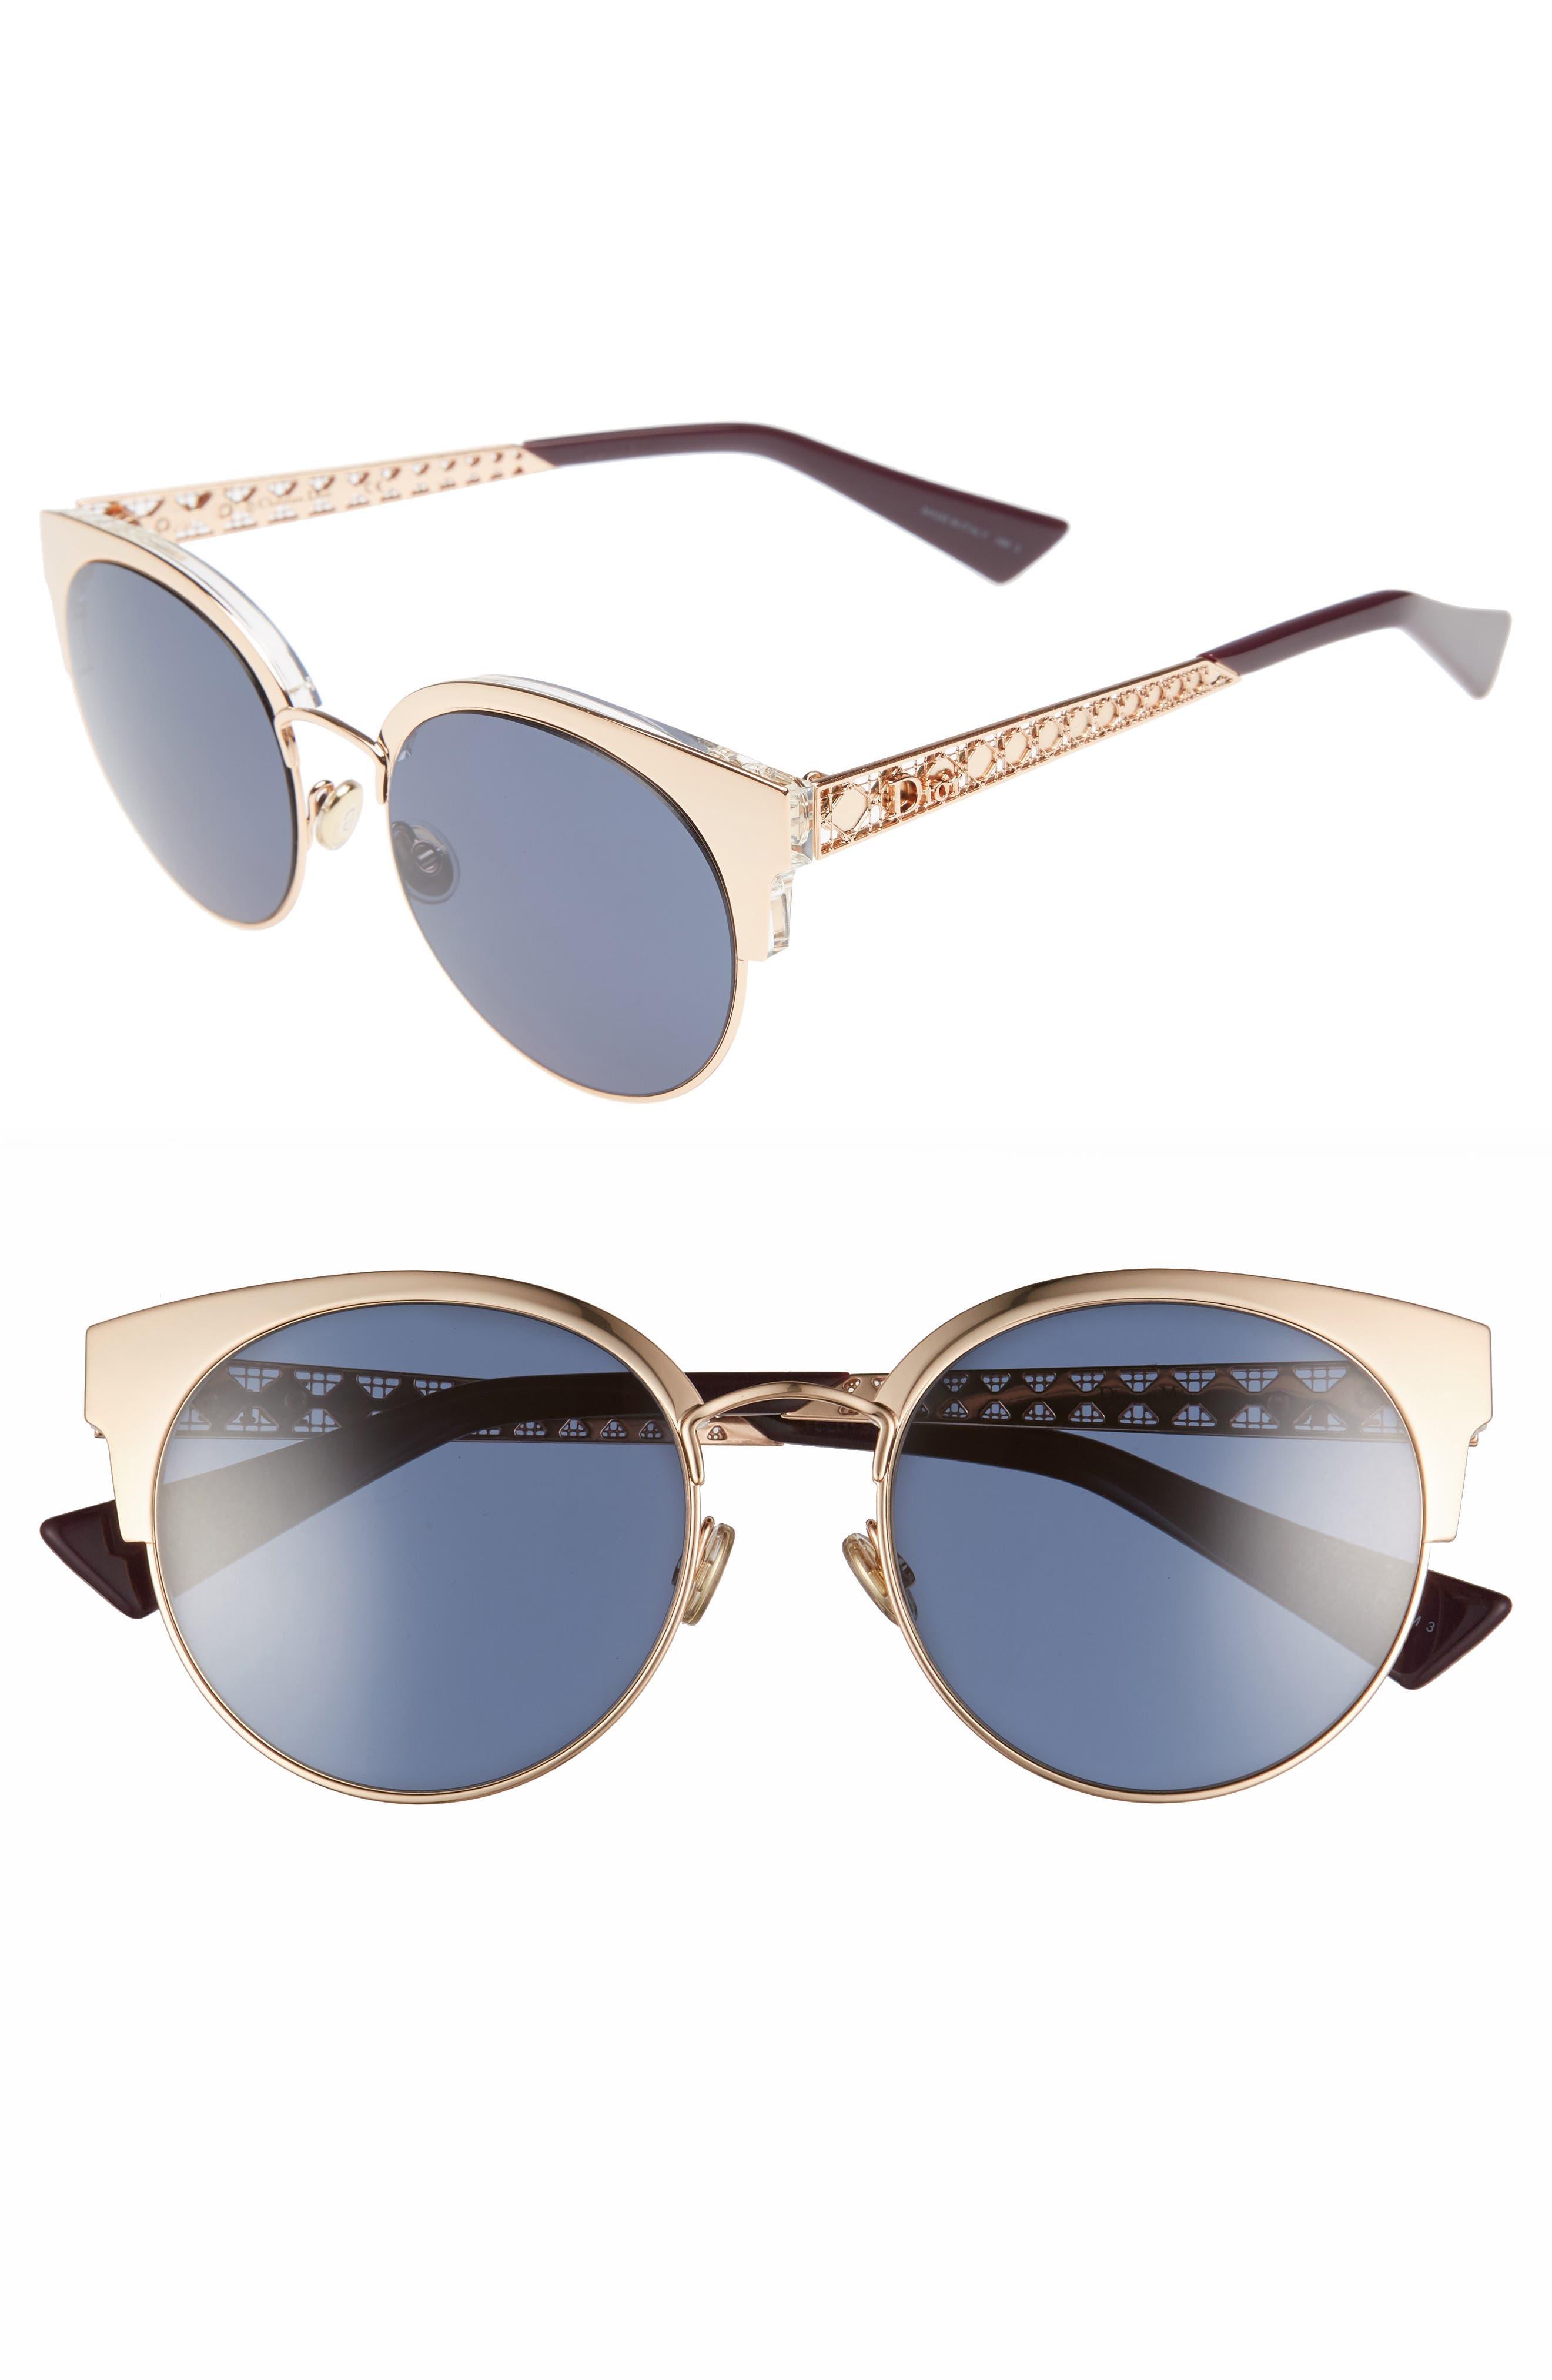 Diorama Mini 54mm Mirrored Lens Cat Eye Sunglasses,                         Main,                         color, Gold/ Copper